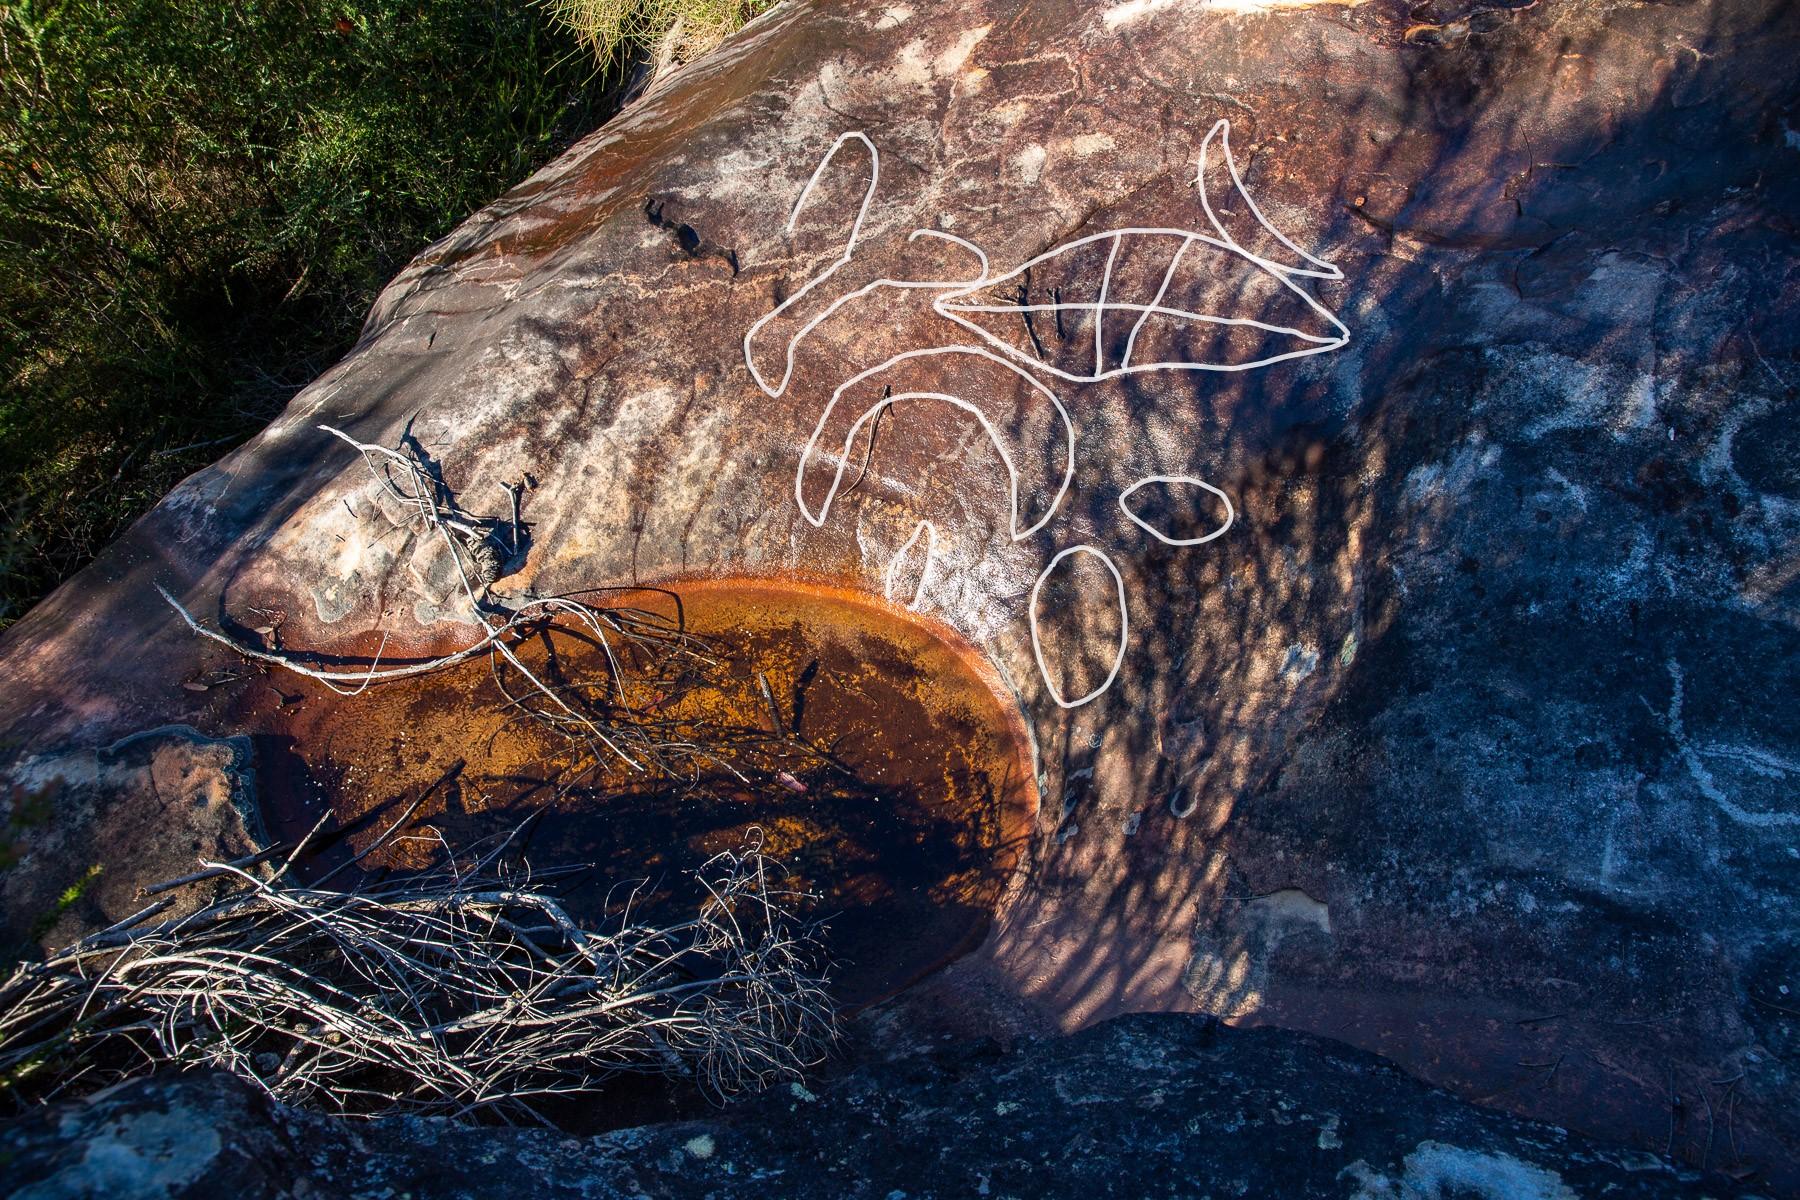 AWAT8349 LR highlighted 1 Mount Murray Anderson West - Waterhole